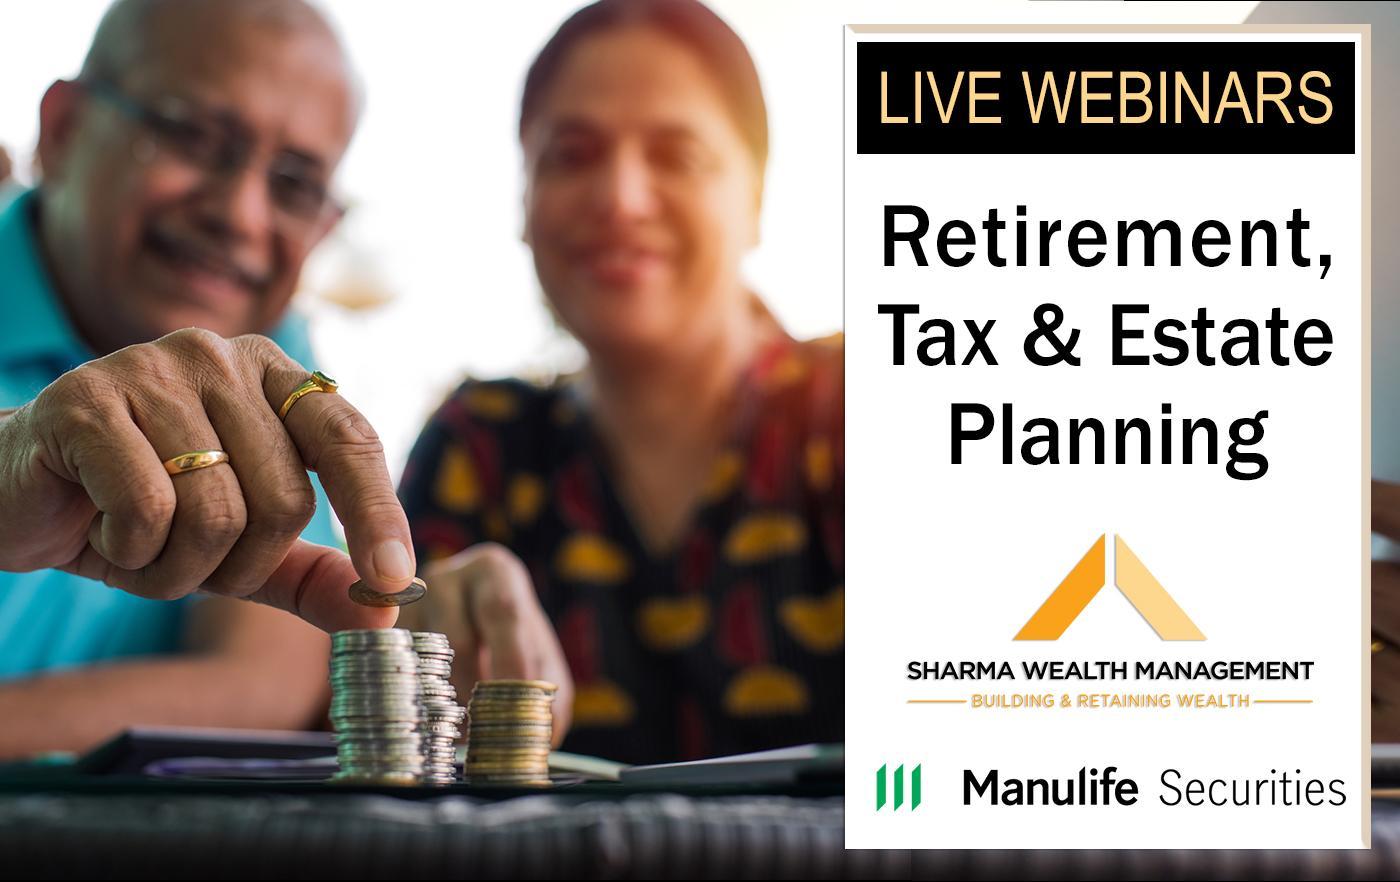 Live Webinar Series: Retirement, Tax & Estate Planning Thumbnail